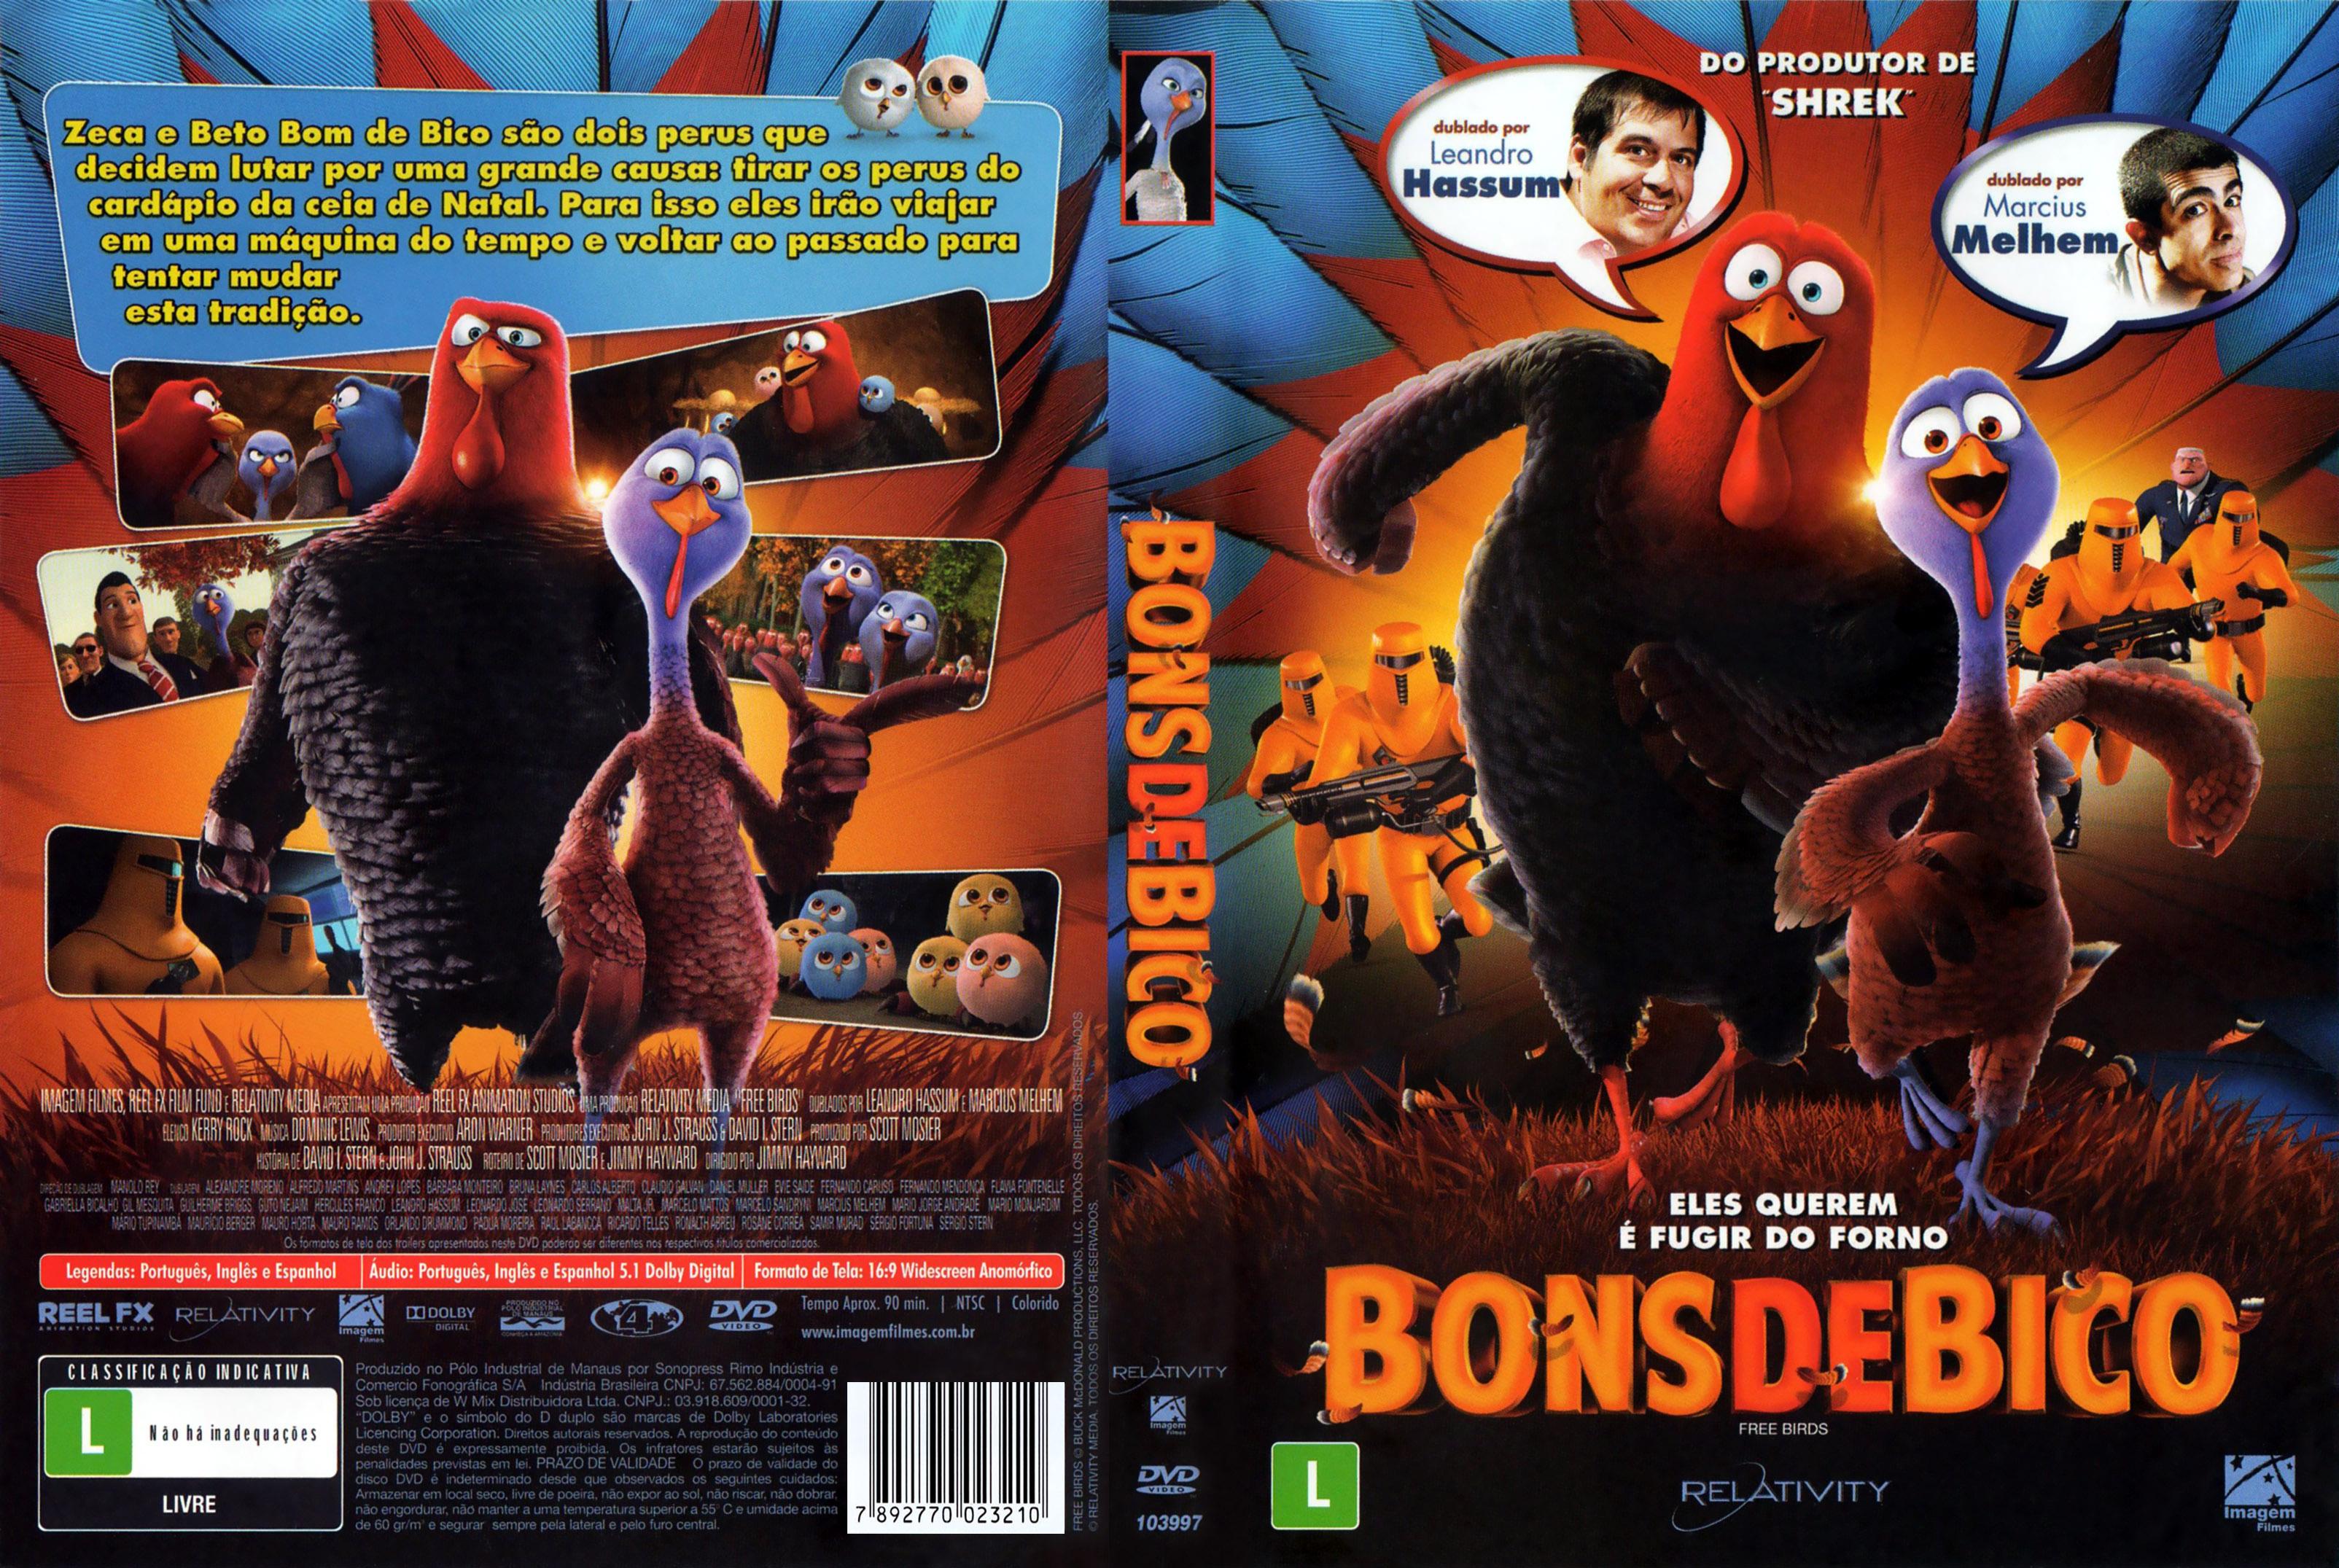 BonsdeBico